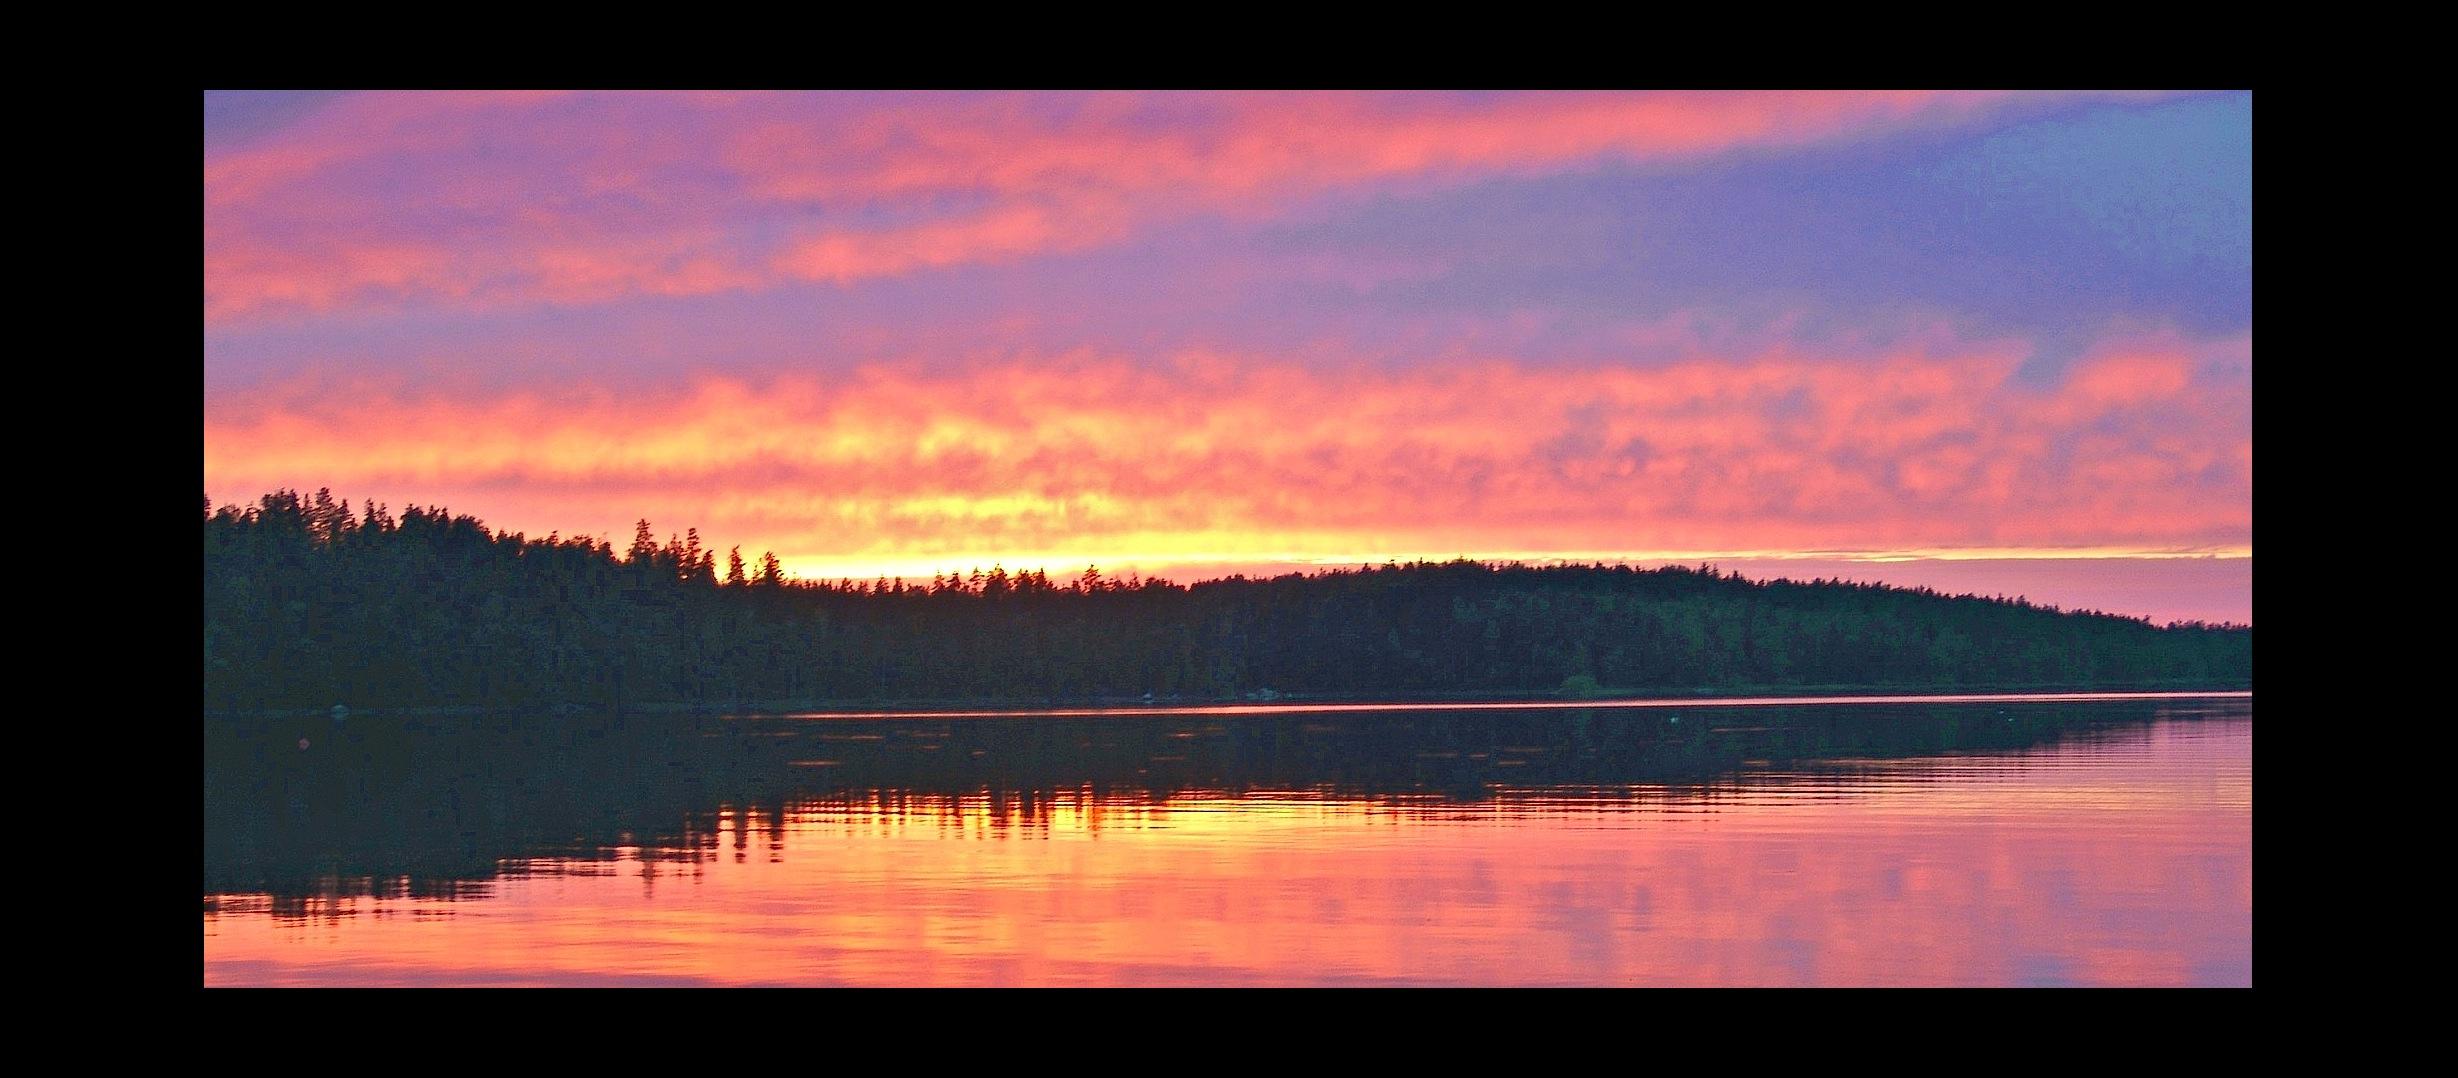 Lake Saimaa, near Lappeenranta, Finland